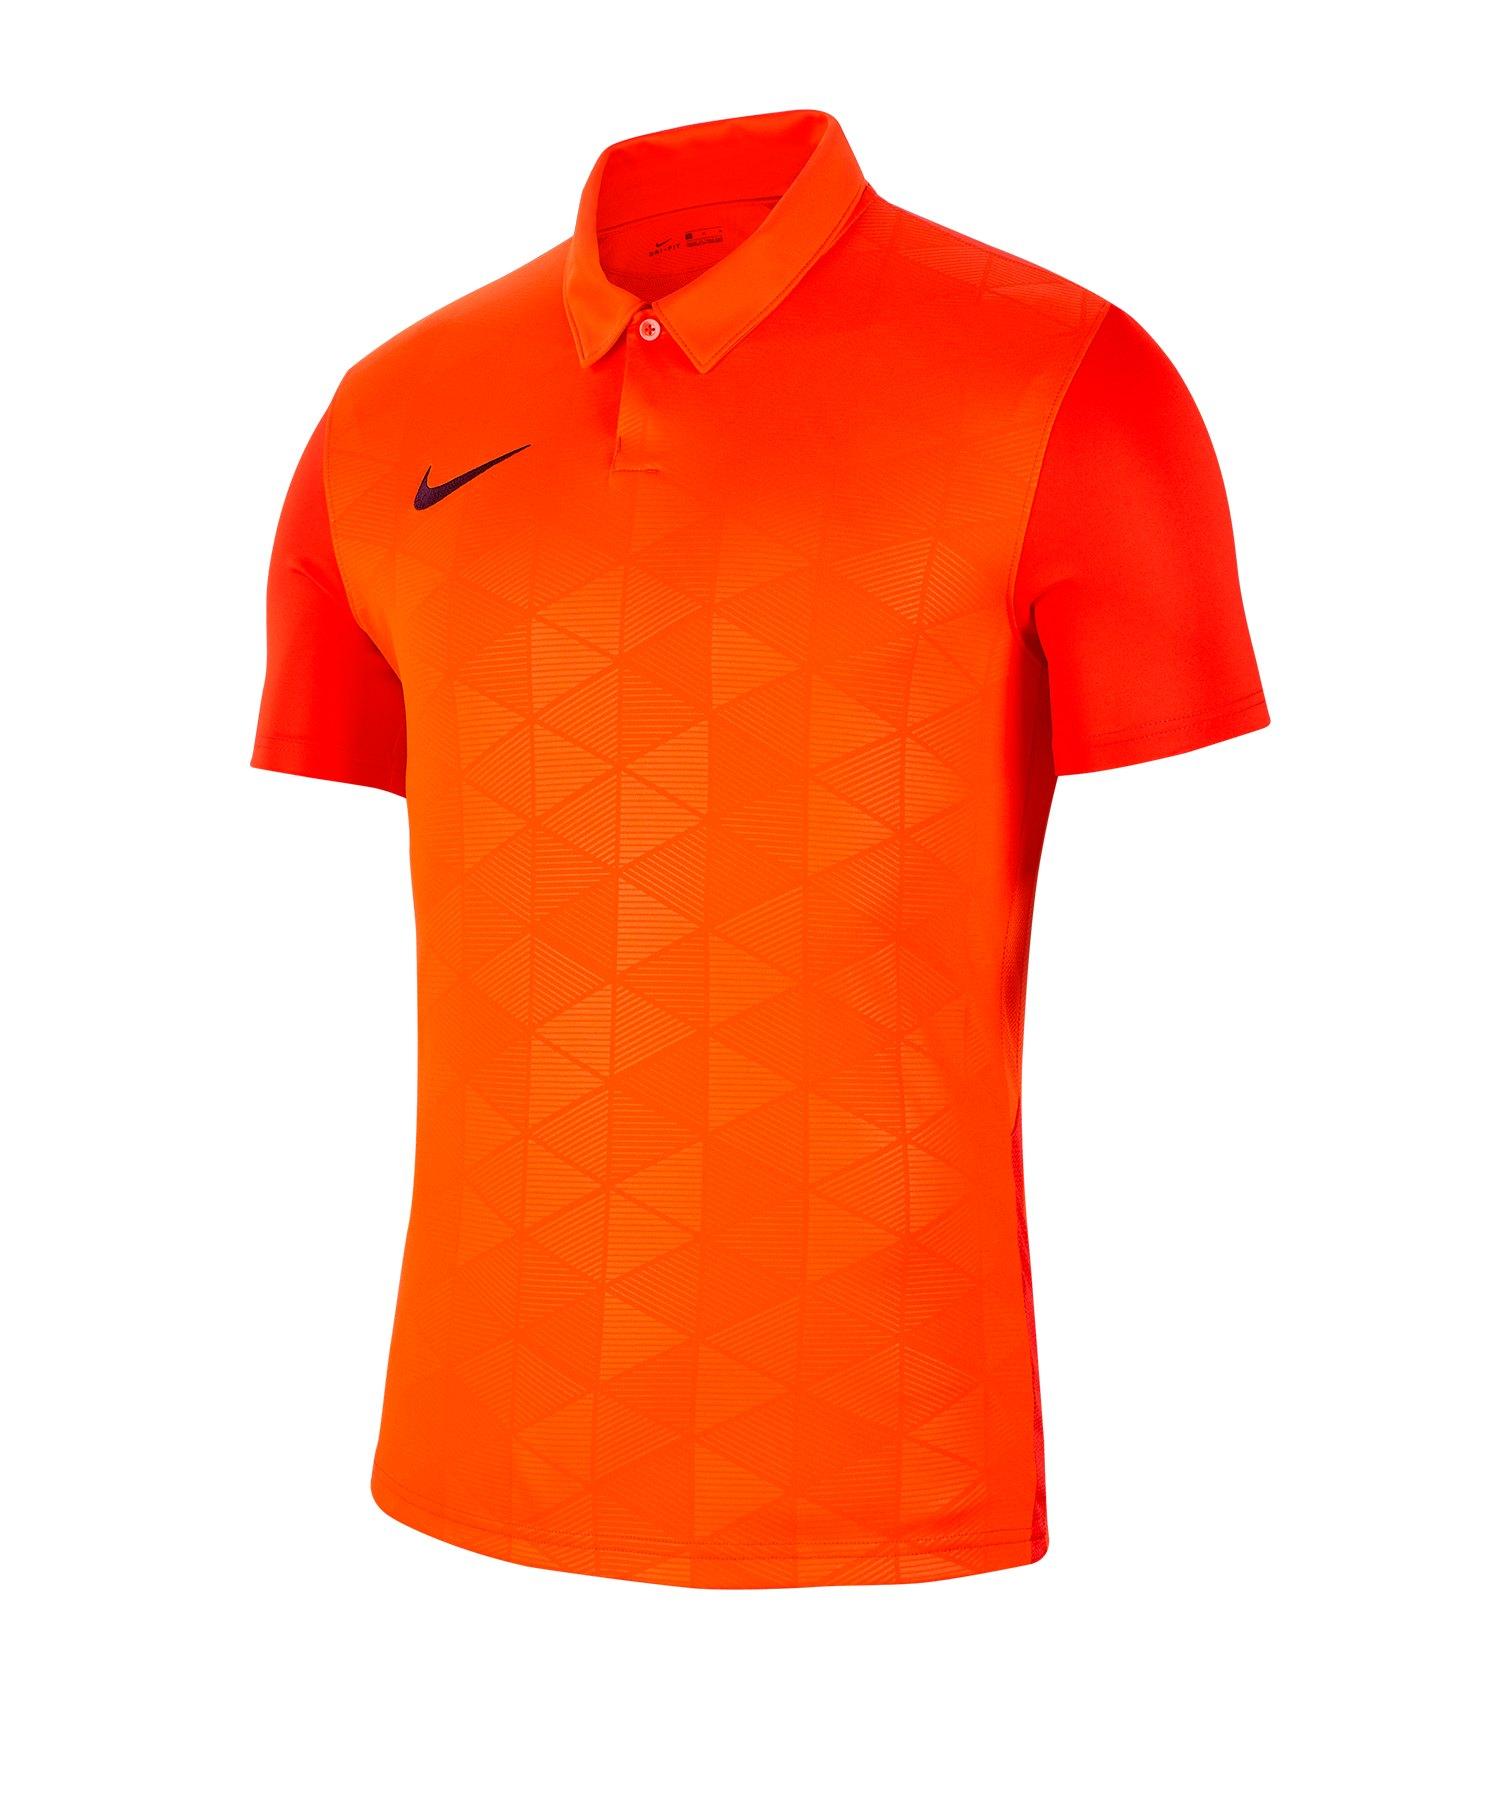 Nike Trophy IV Trikot kurzarm Orange F819 - orange